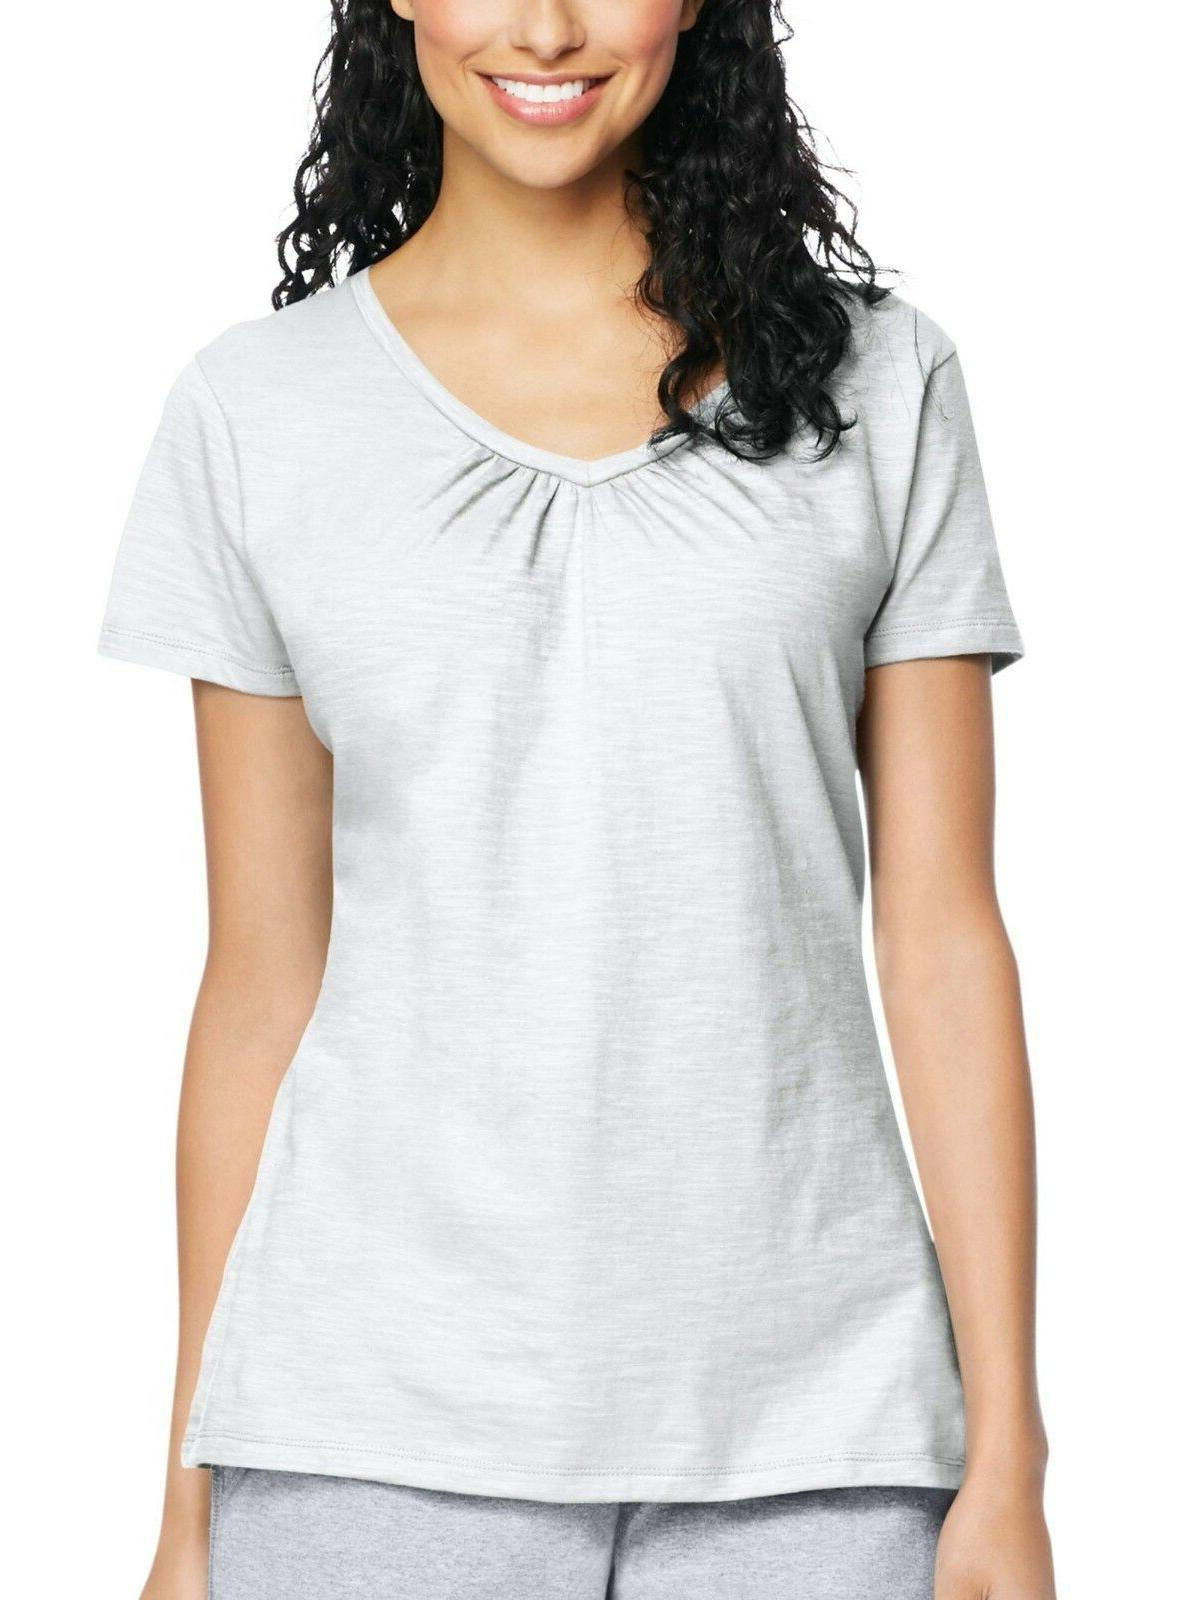 Hanes Women's Jersey Shirred V-Neck Tee XL